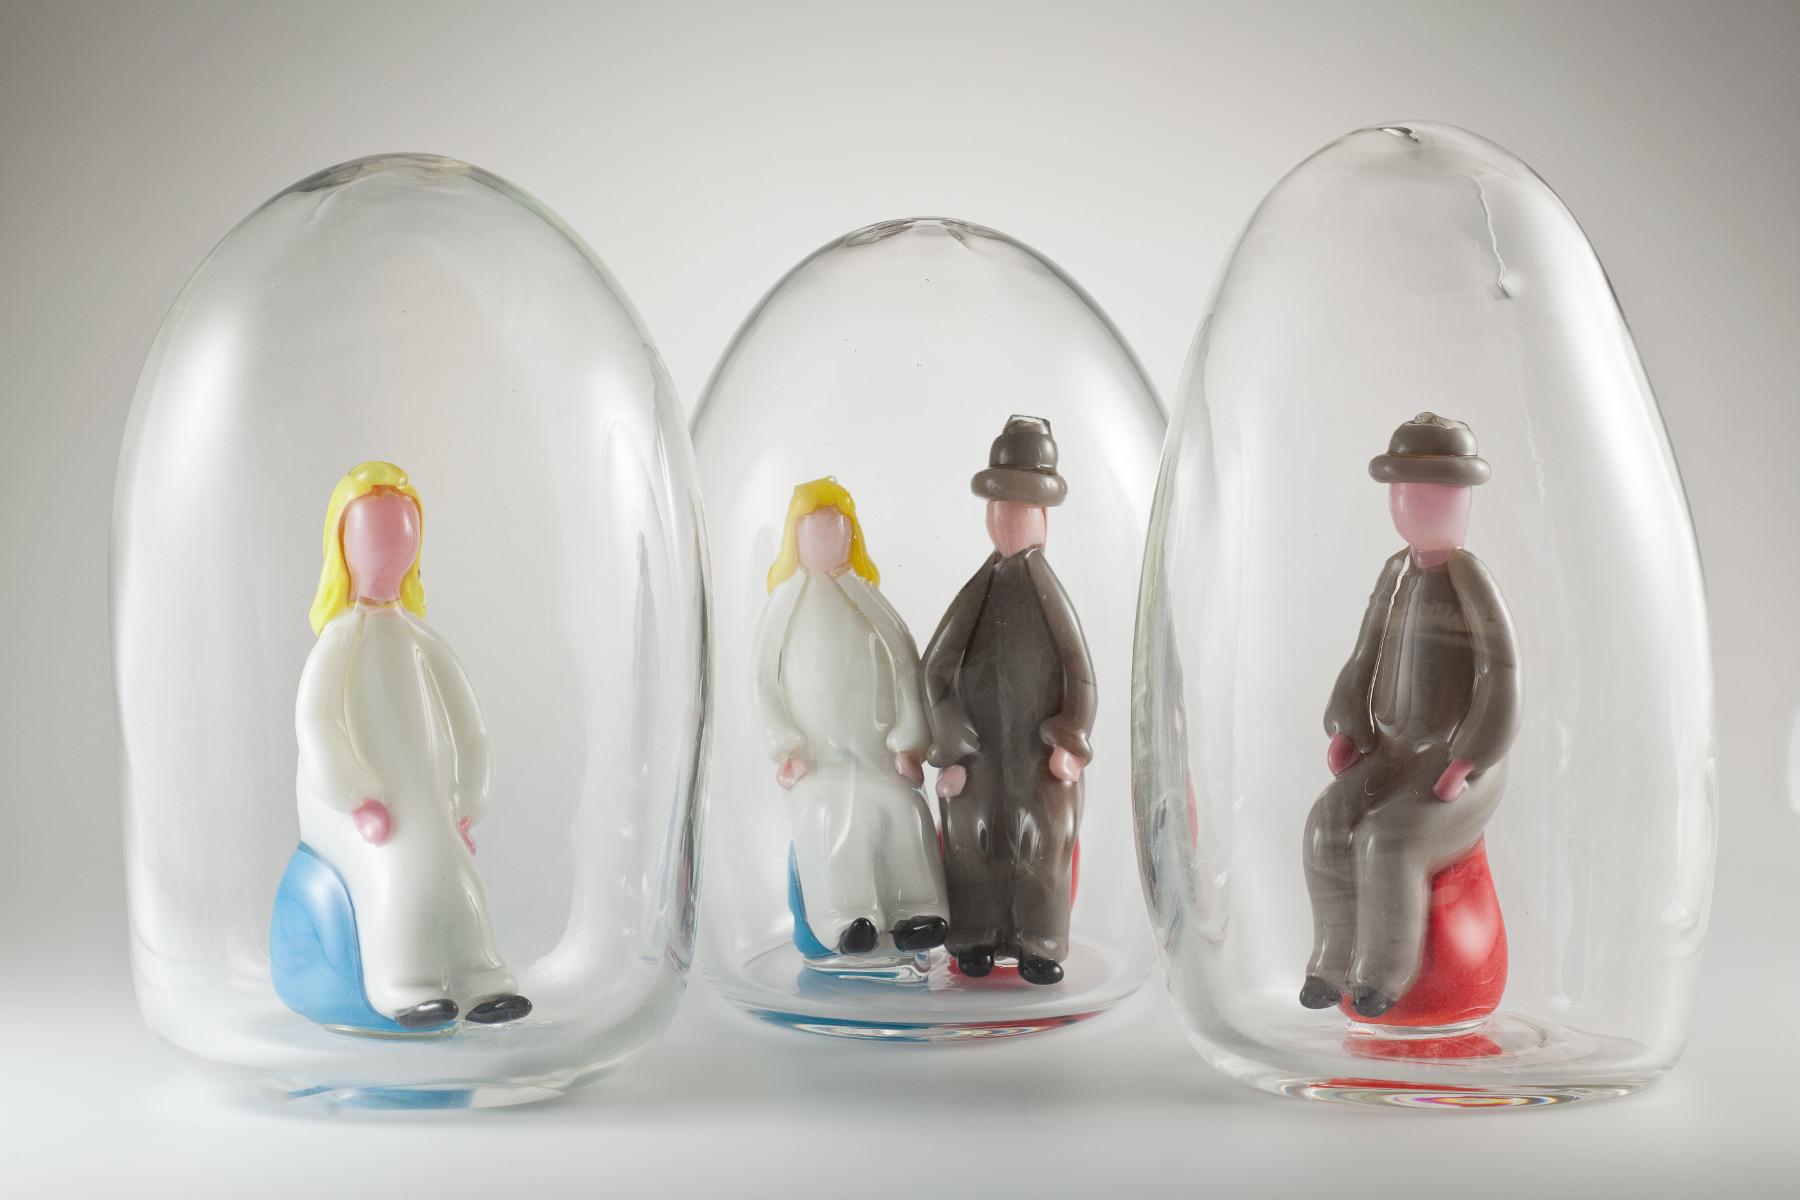 Marie Louise Ekman - The Transparent Family